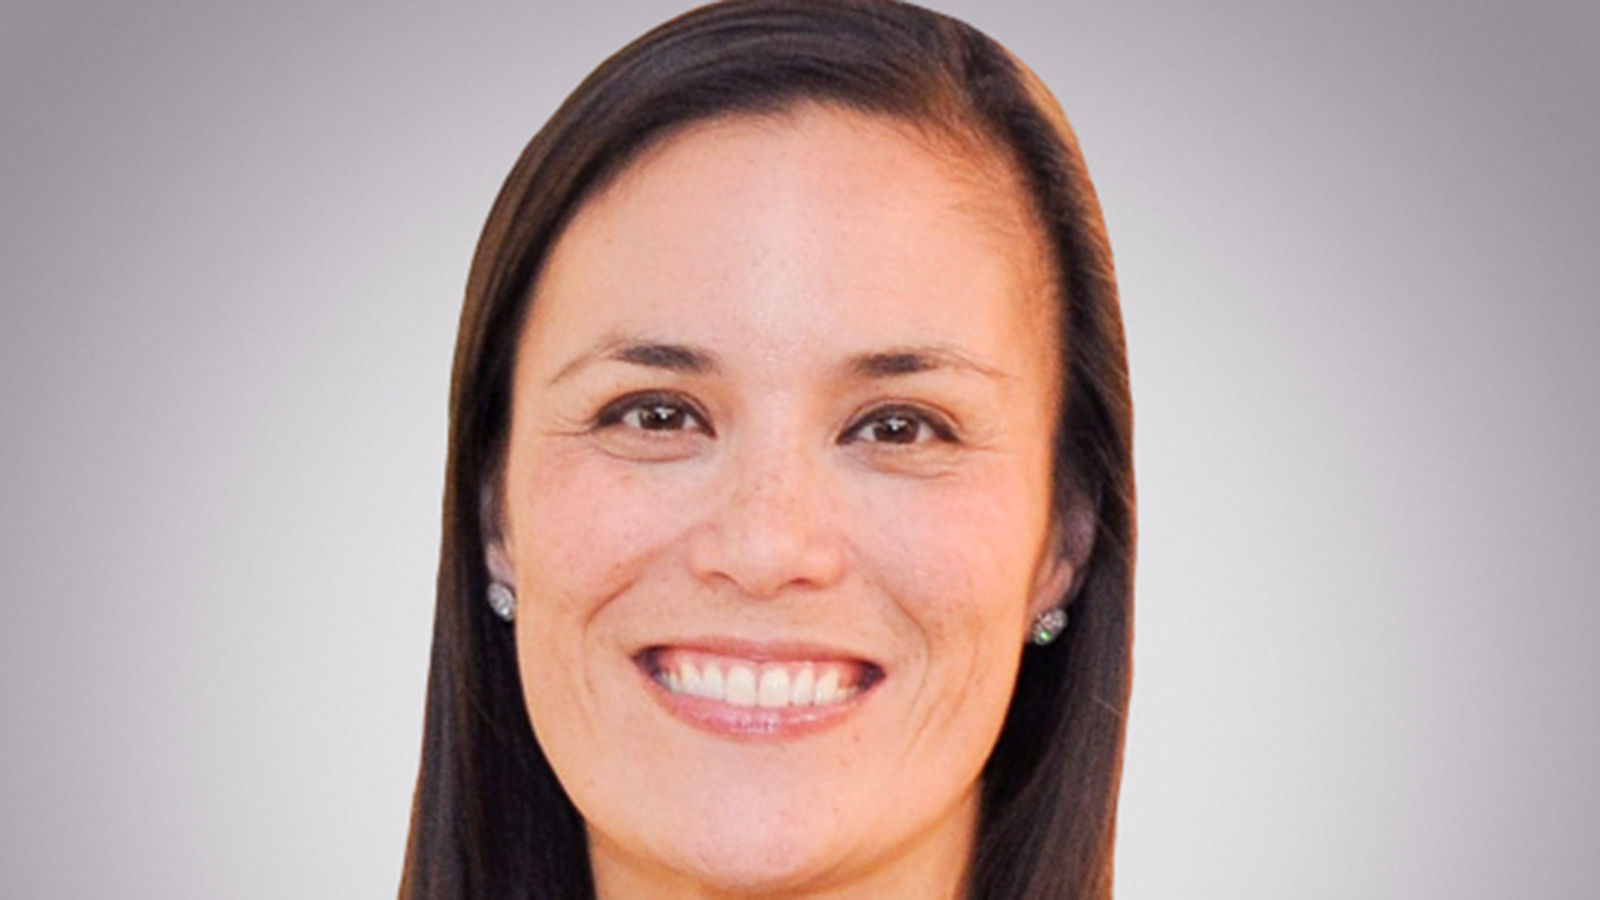 HRC Endorses Gina Ortiz Jones for U.S. Congress